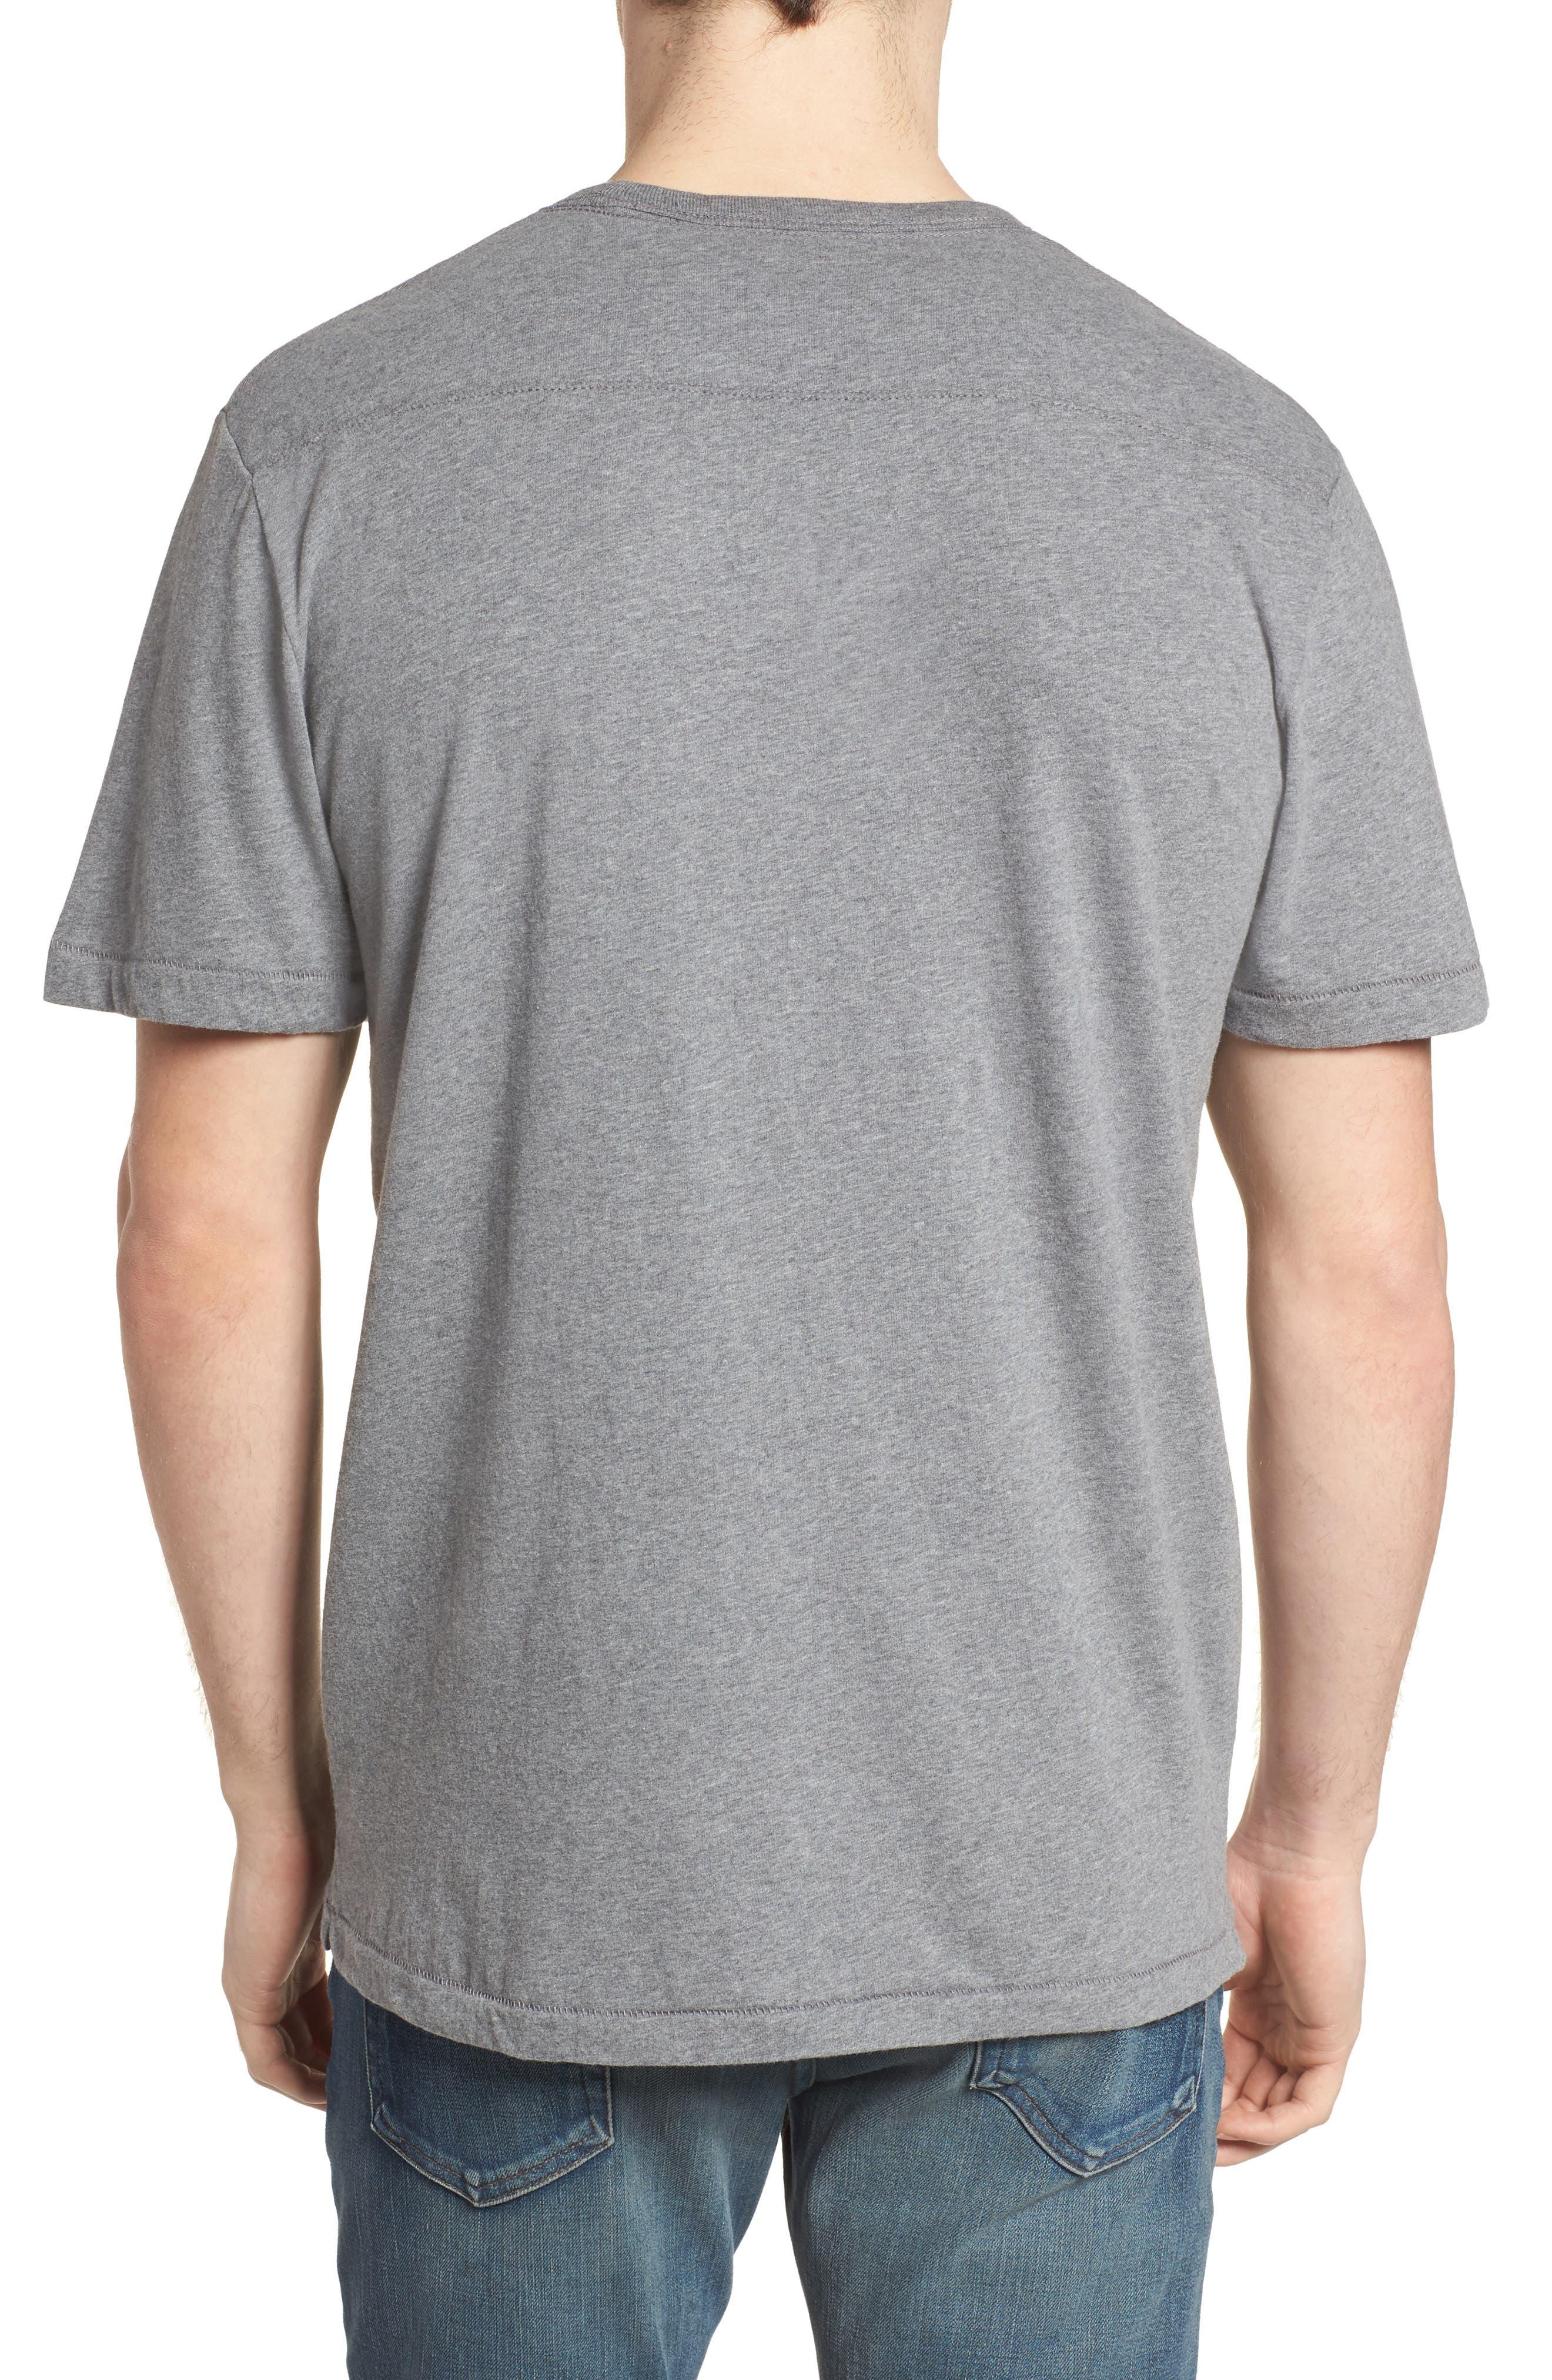 Solidarity Slim Fit Crewneck T-Shirt,                             Alternate thumbnail 2, color,                             Mid Grey Melange/ Black